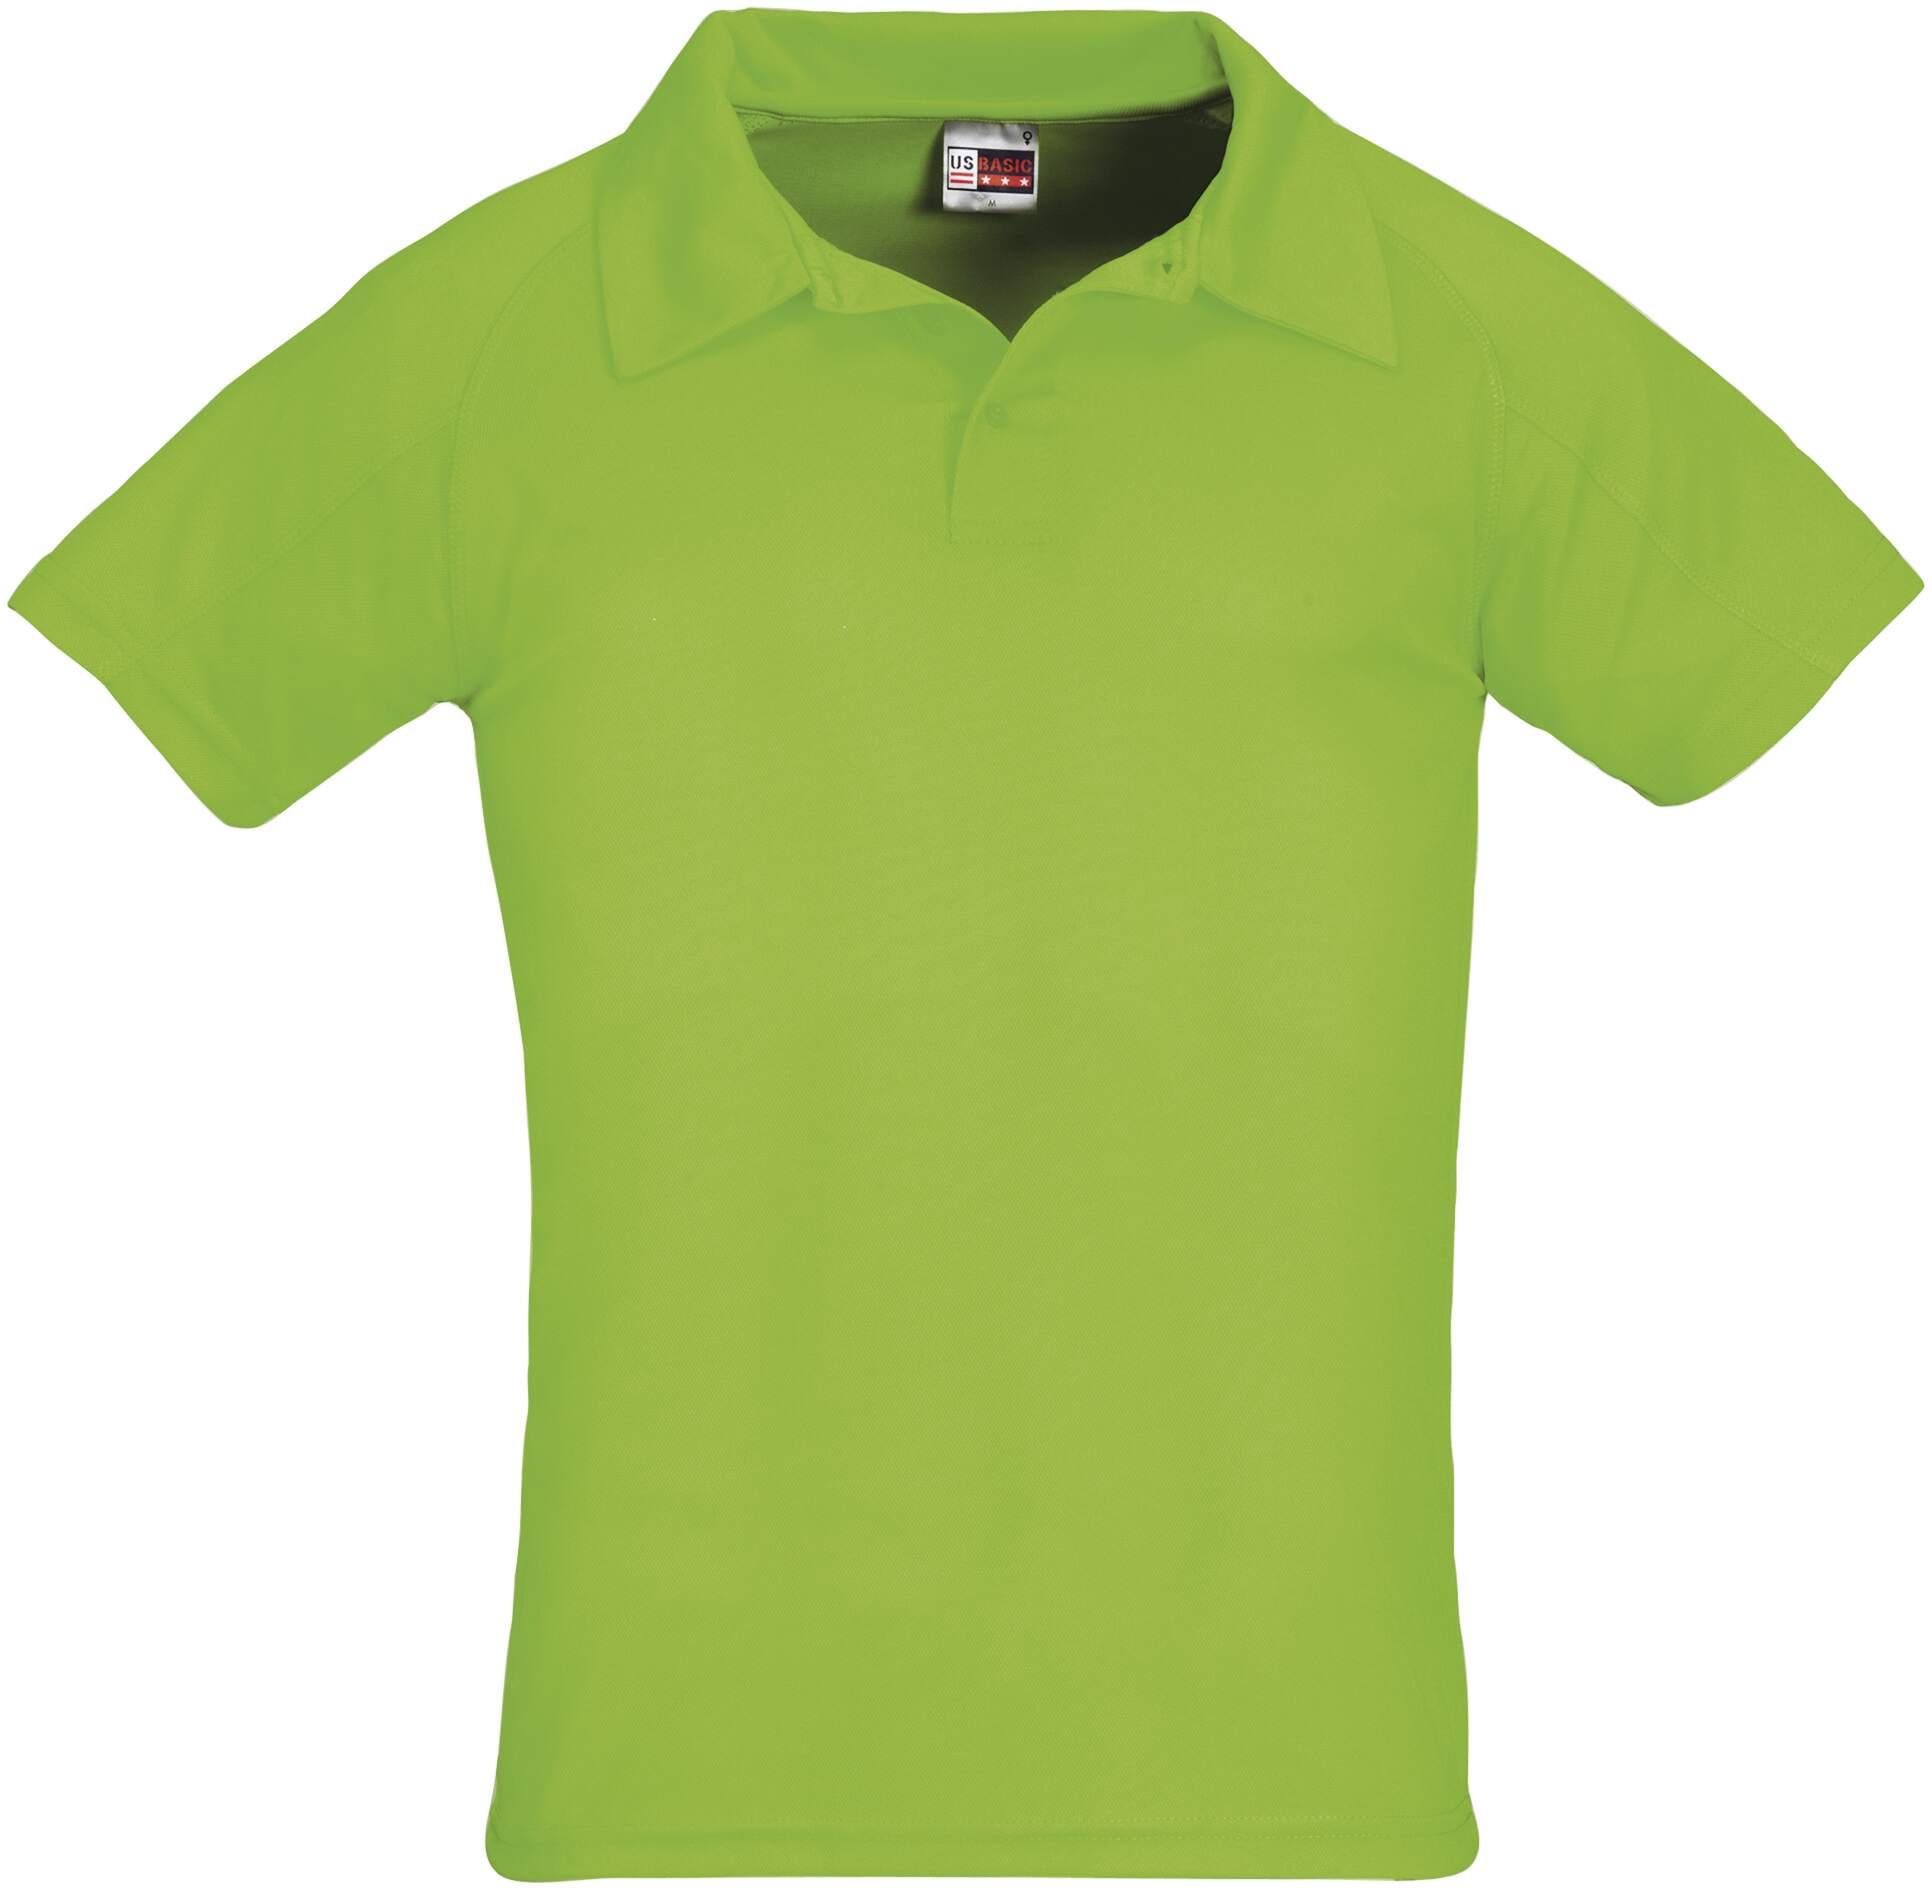 Koszulku Polo US 31098 Cool Fit - 31098_zielony_US - Kolor: Zielony